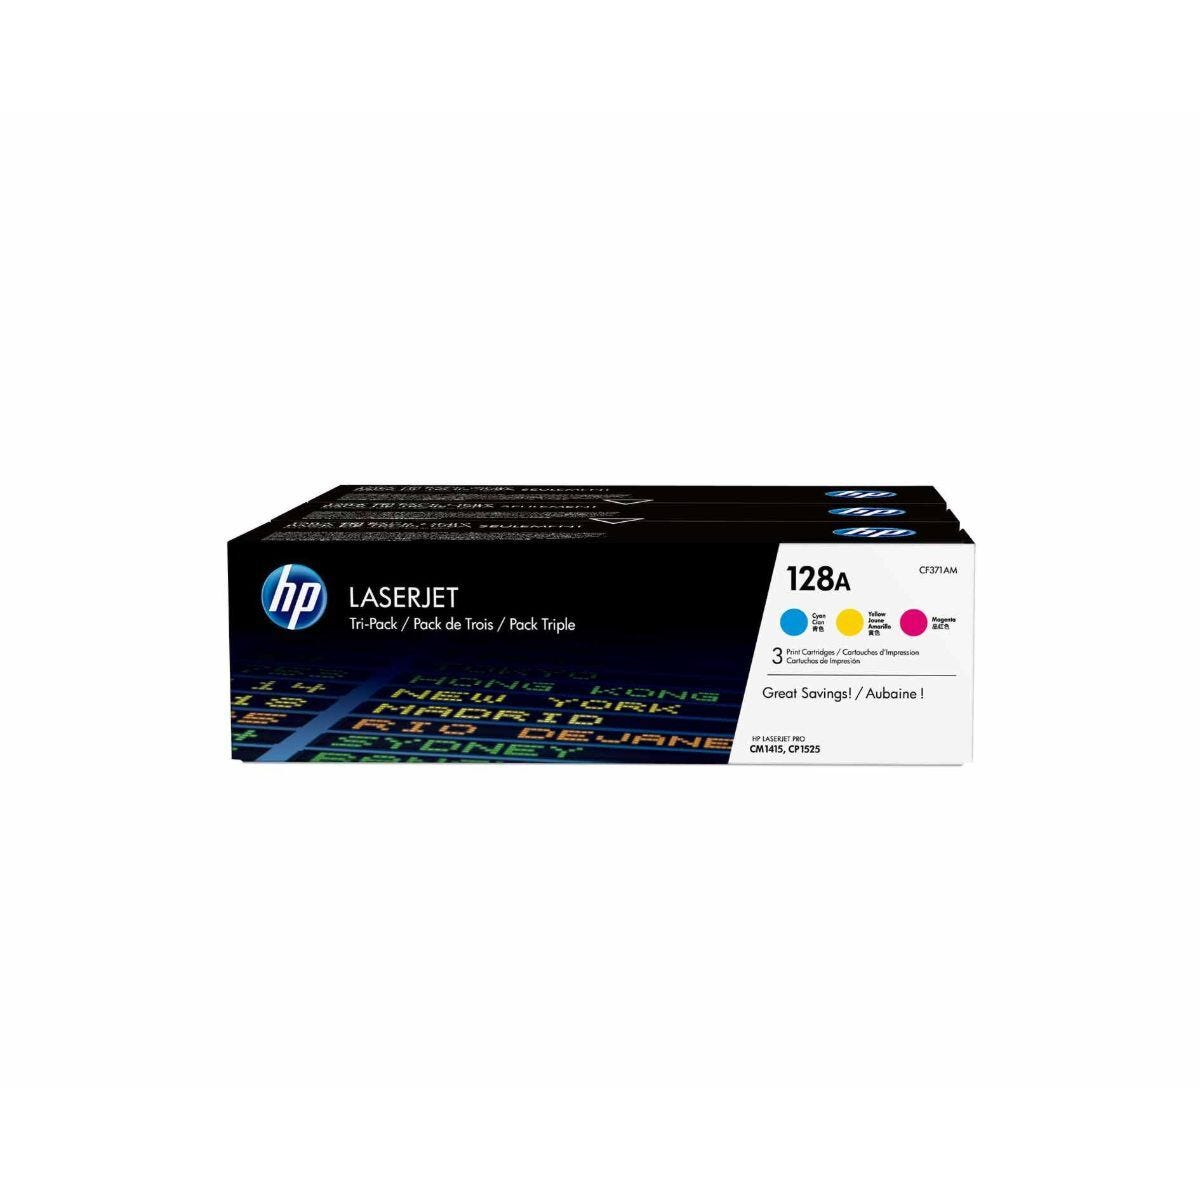 HP 128A 3 Colour Multipack Original Toner Cartridge